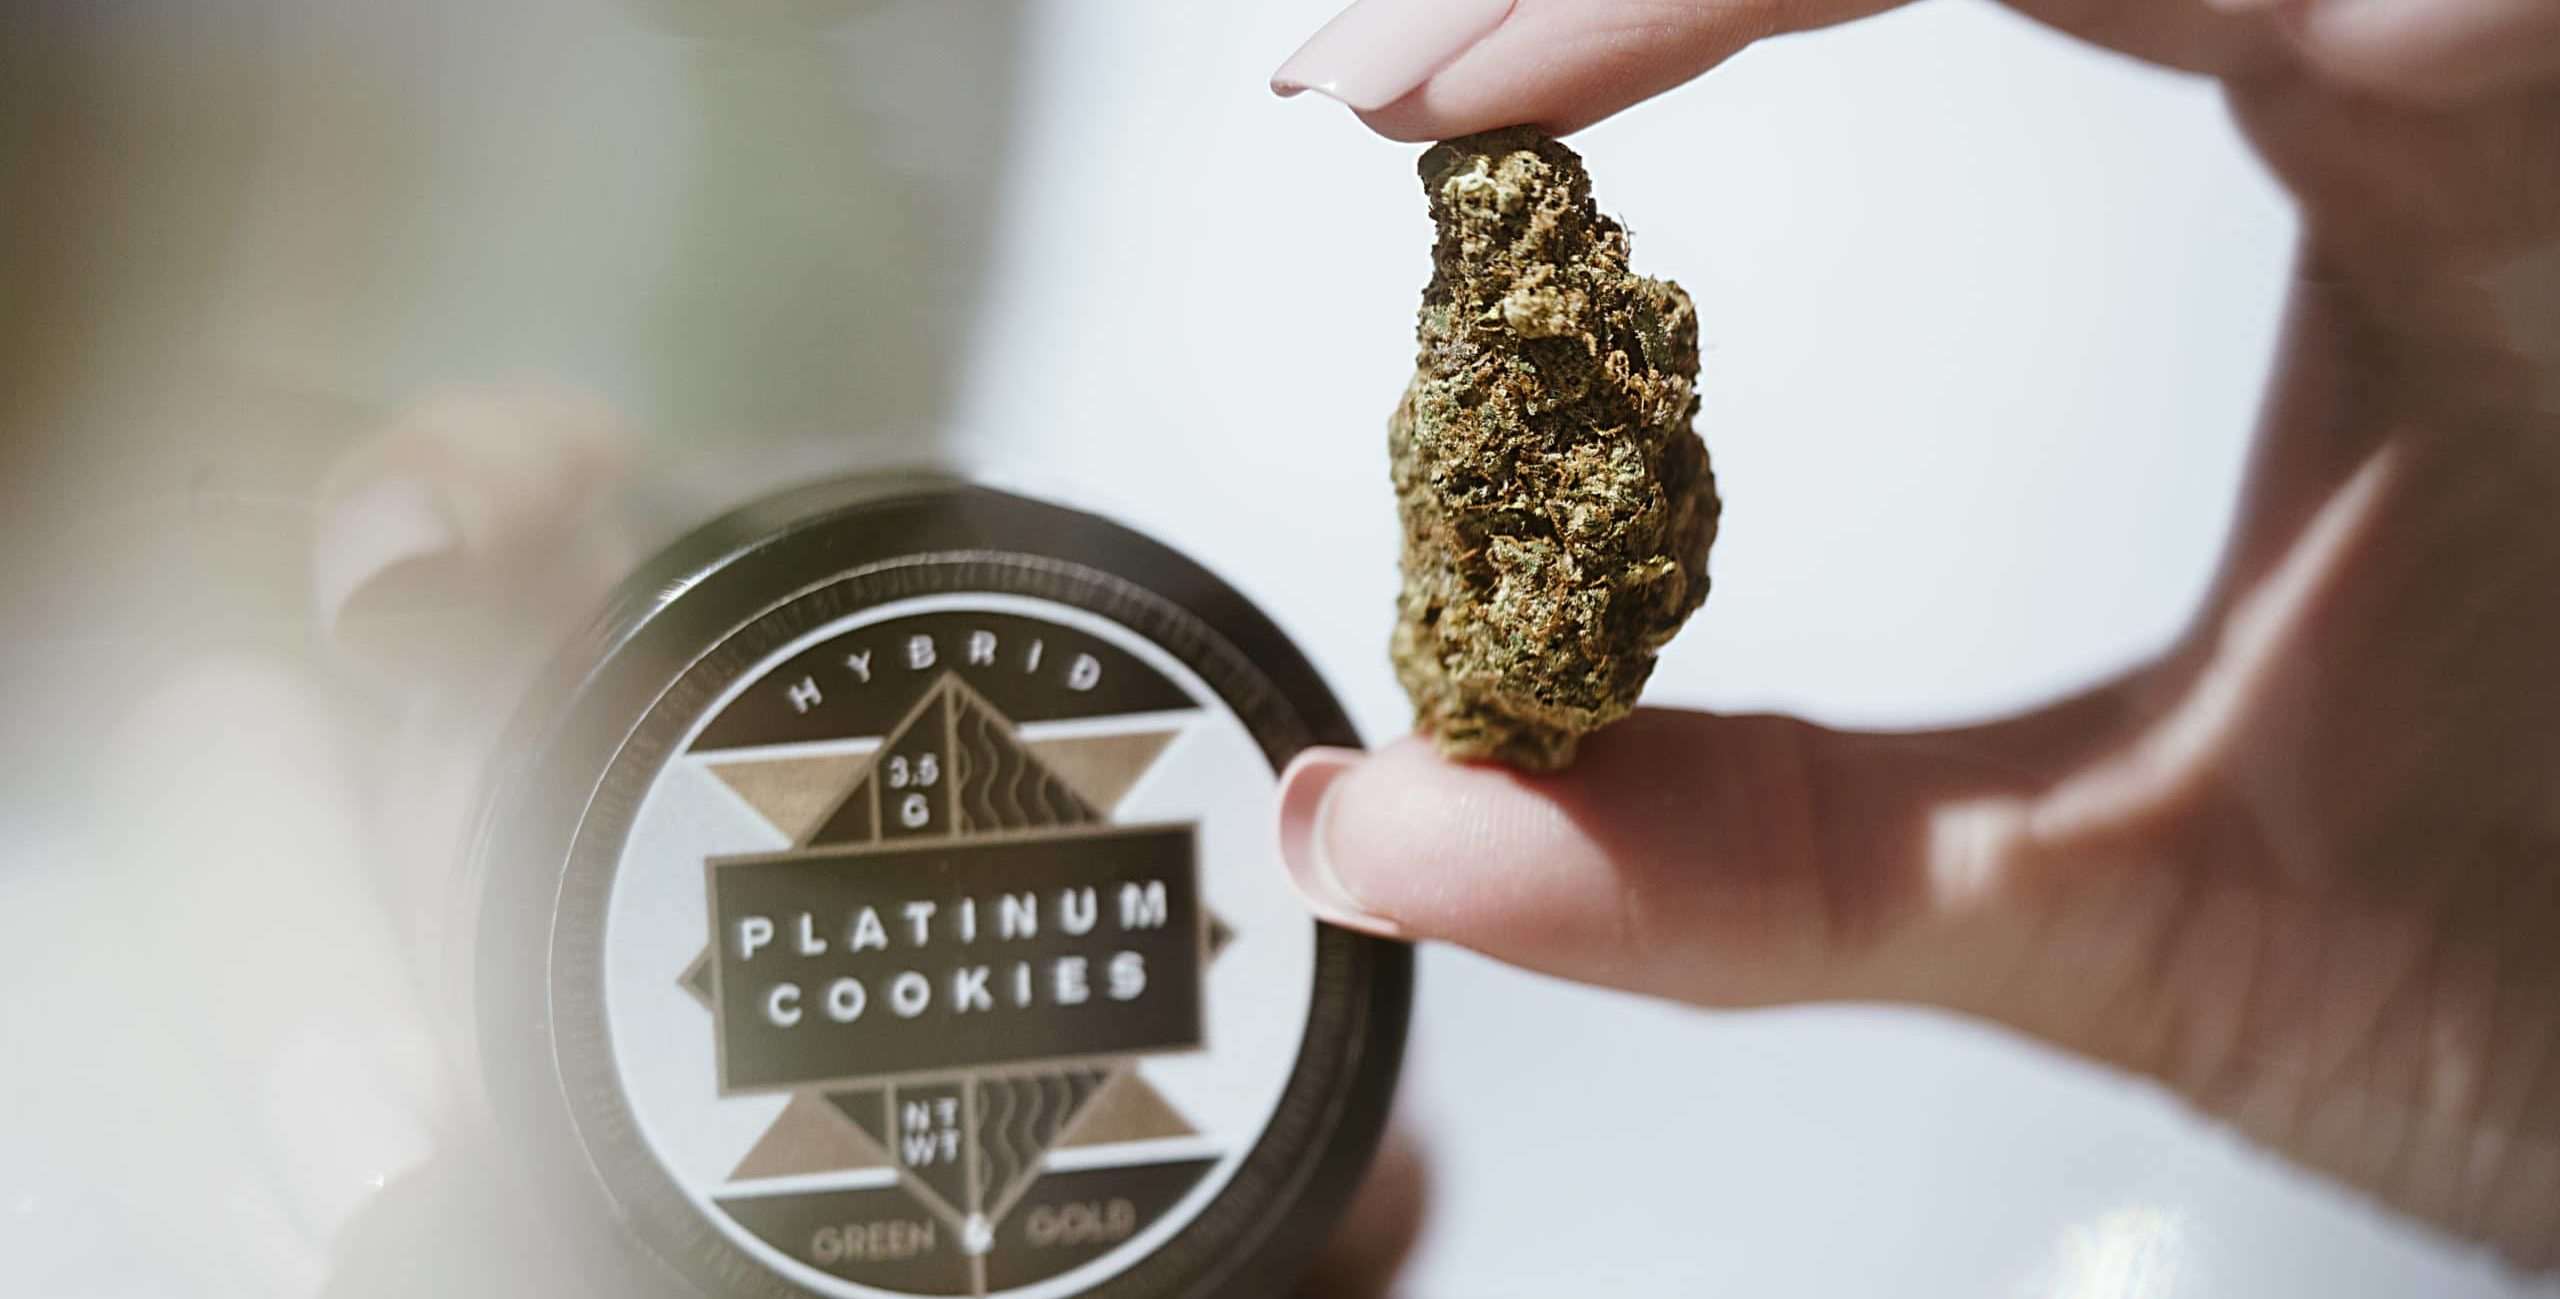 woman holding cannabis flower